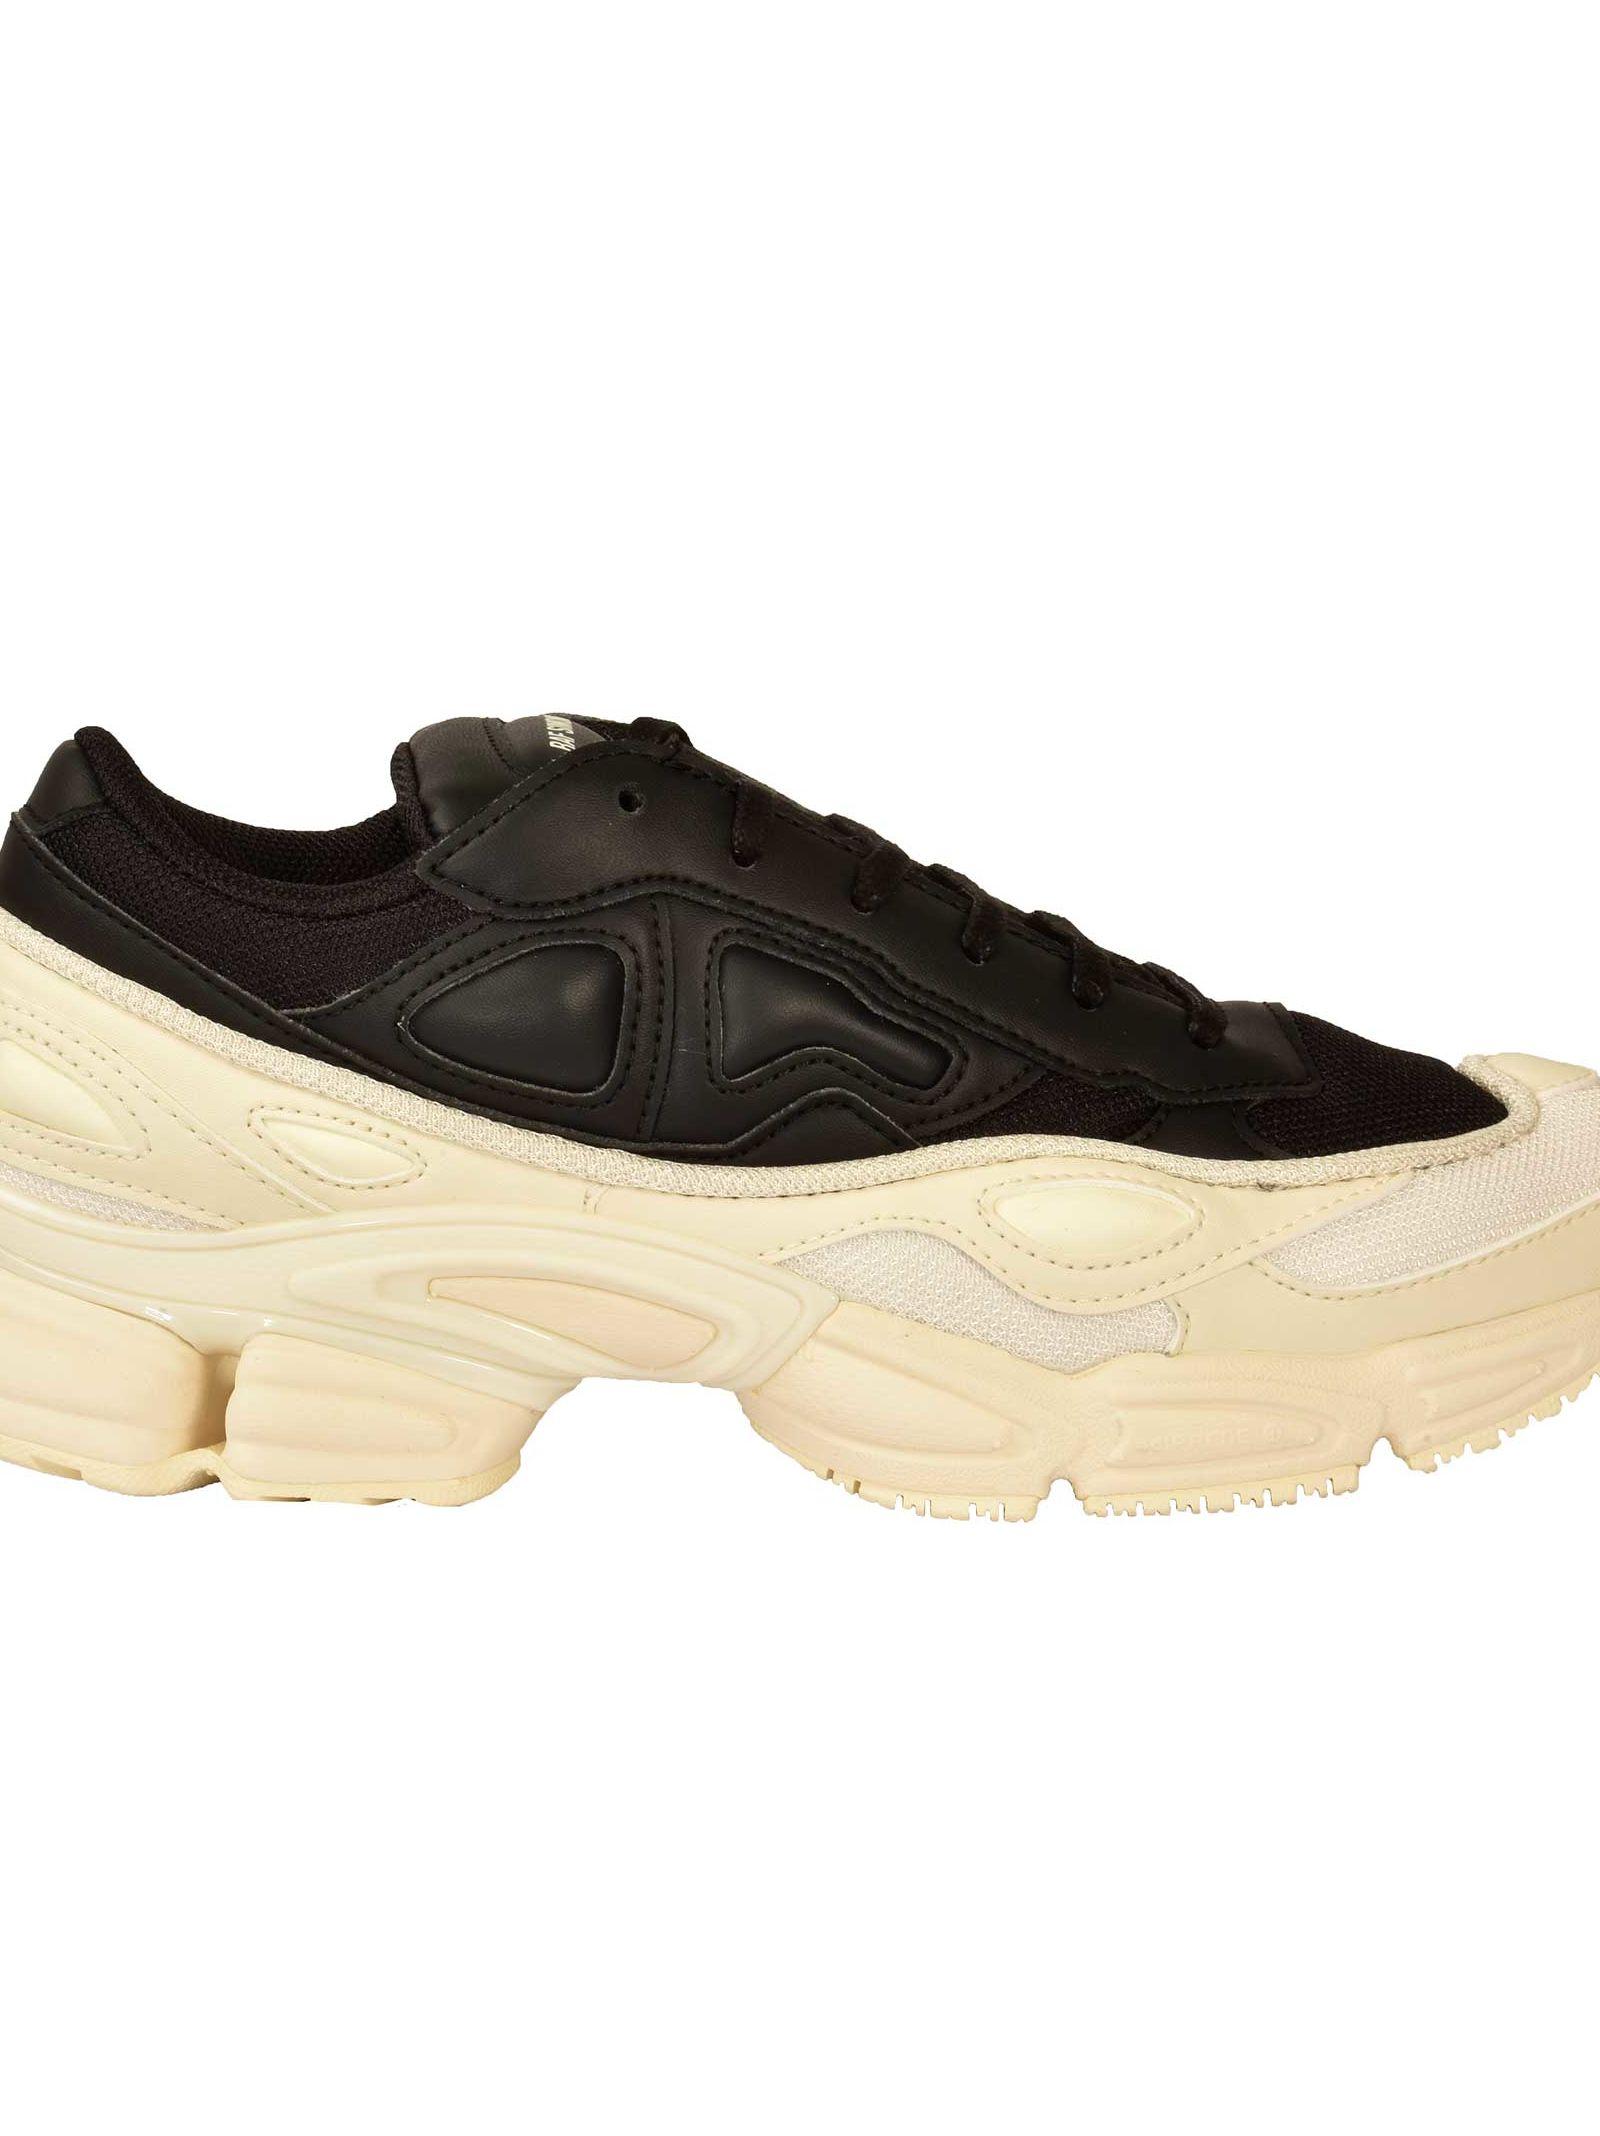 Rs Ozweego Sneakers, Cwhite Cblack Cblack